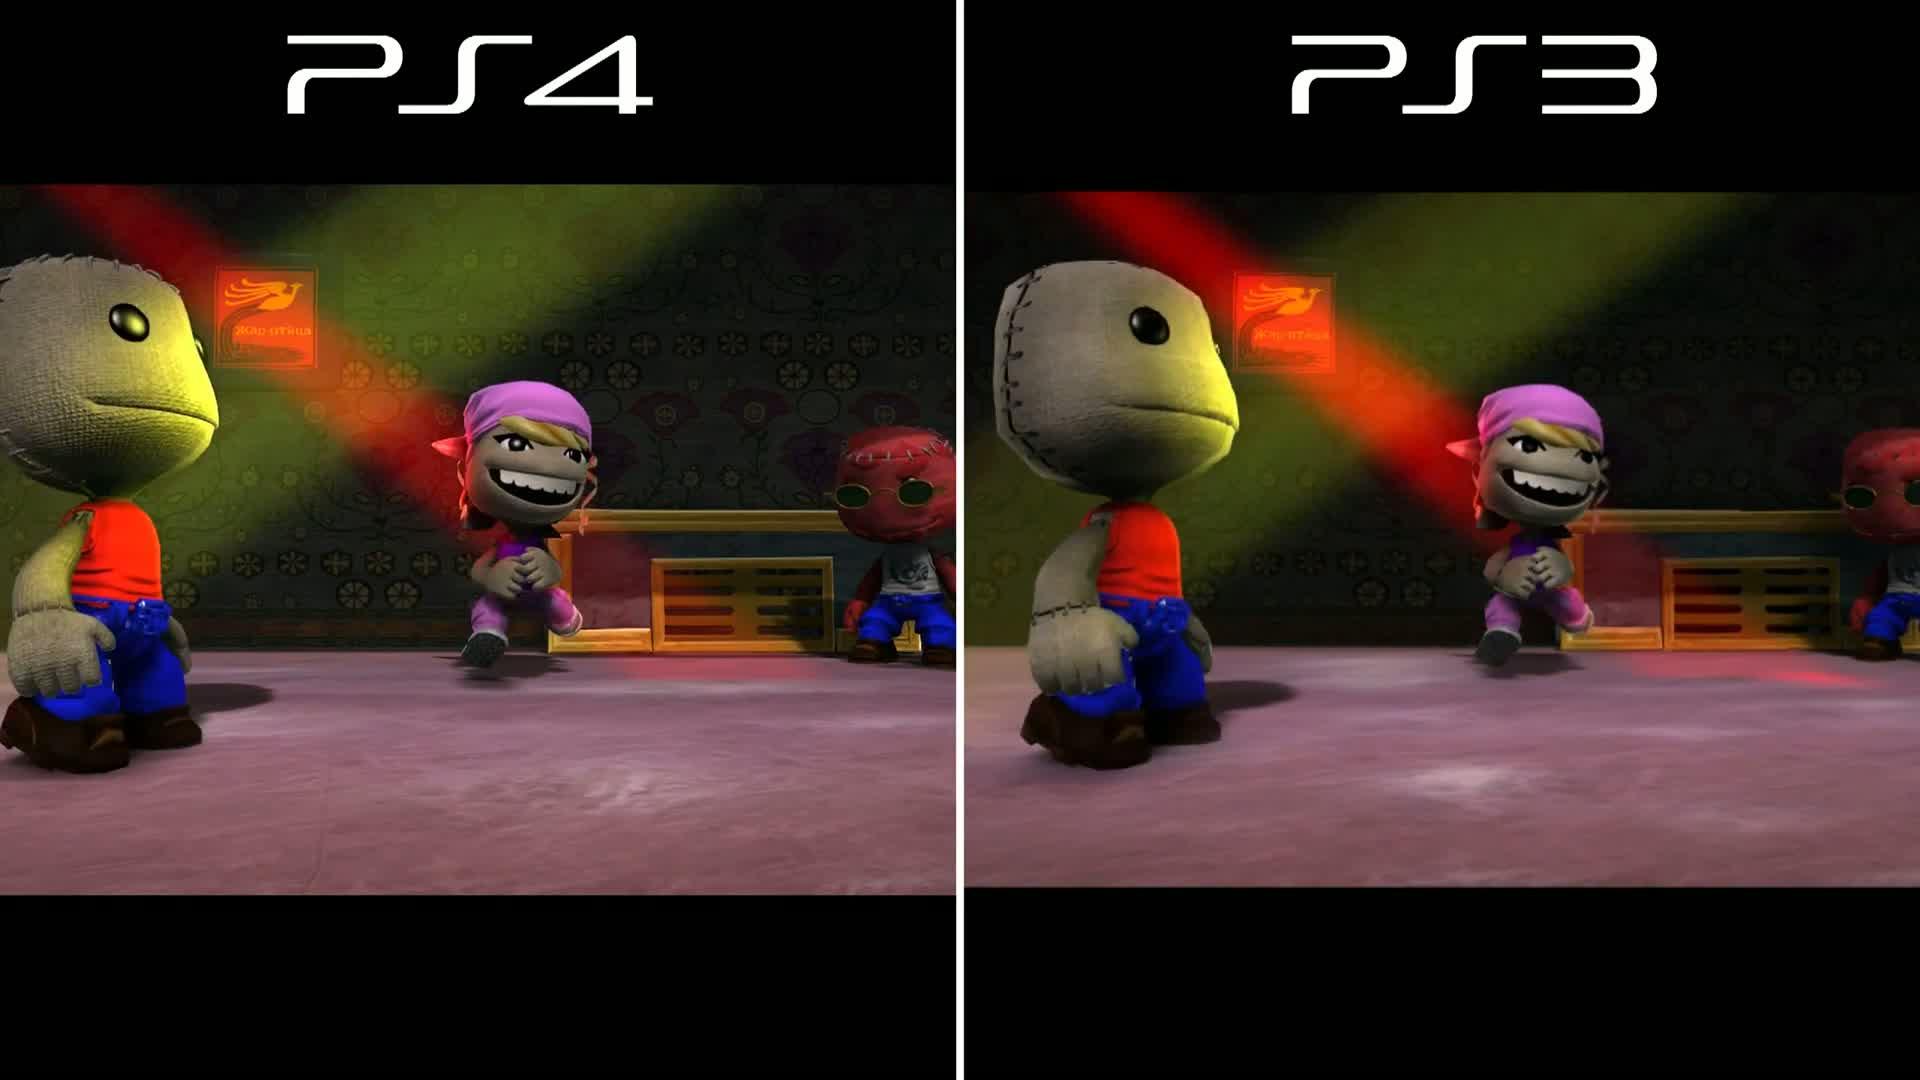 Littlebigplanet 3 Gamescz Ps4 Little Big Planet Beta Ps3 Vs Graphics Comparison Lbp3